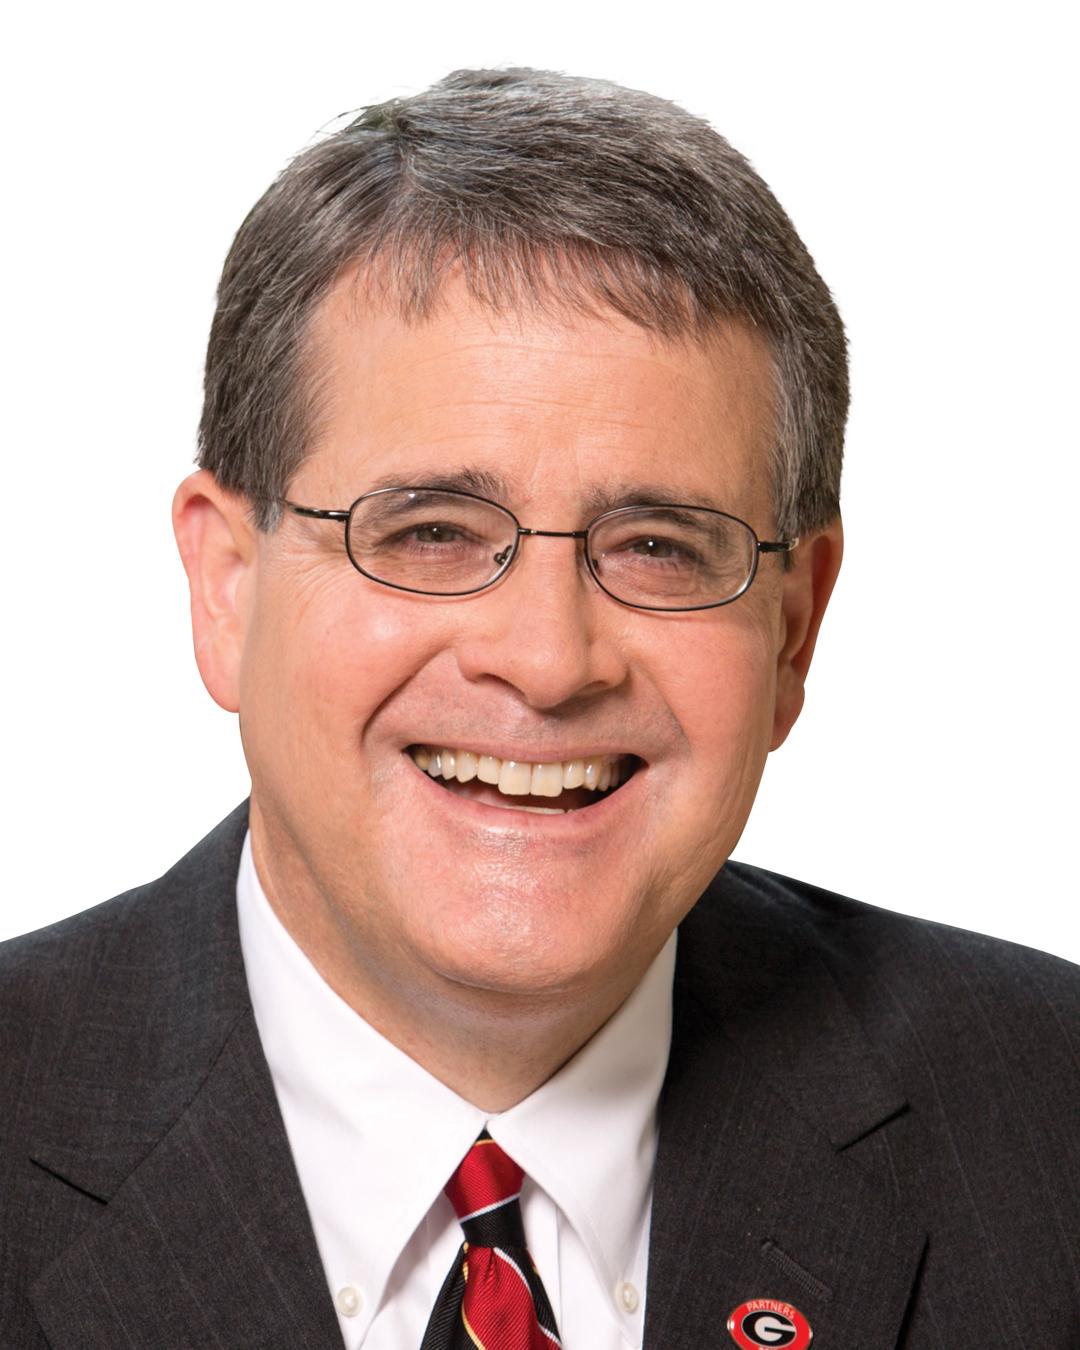 Atlanta 500: Jere W. Morehead